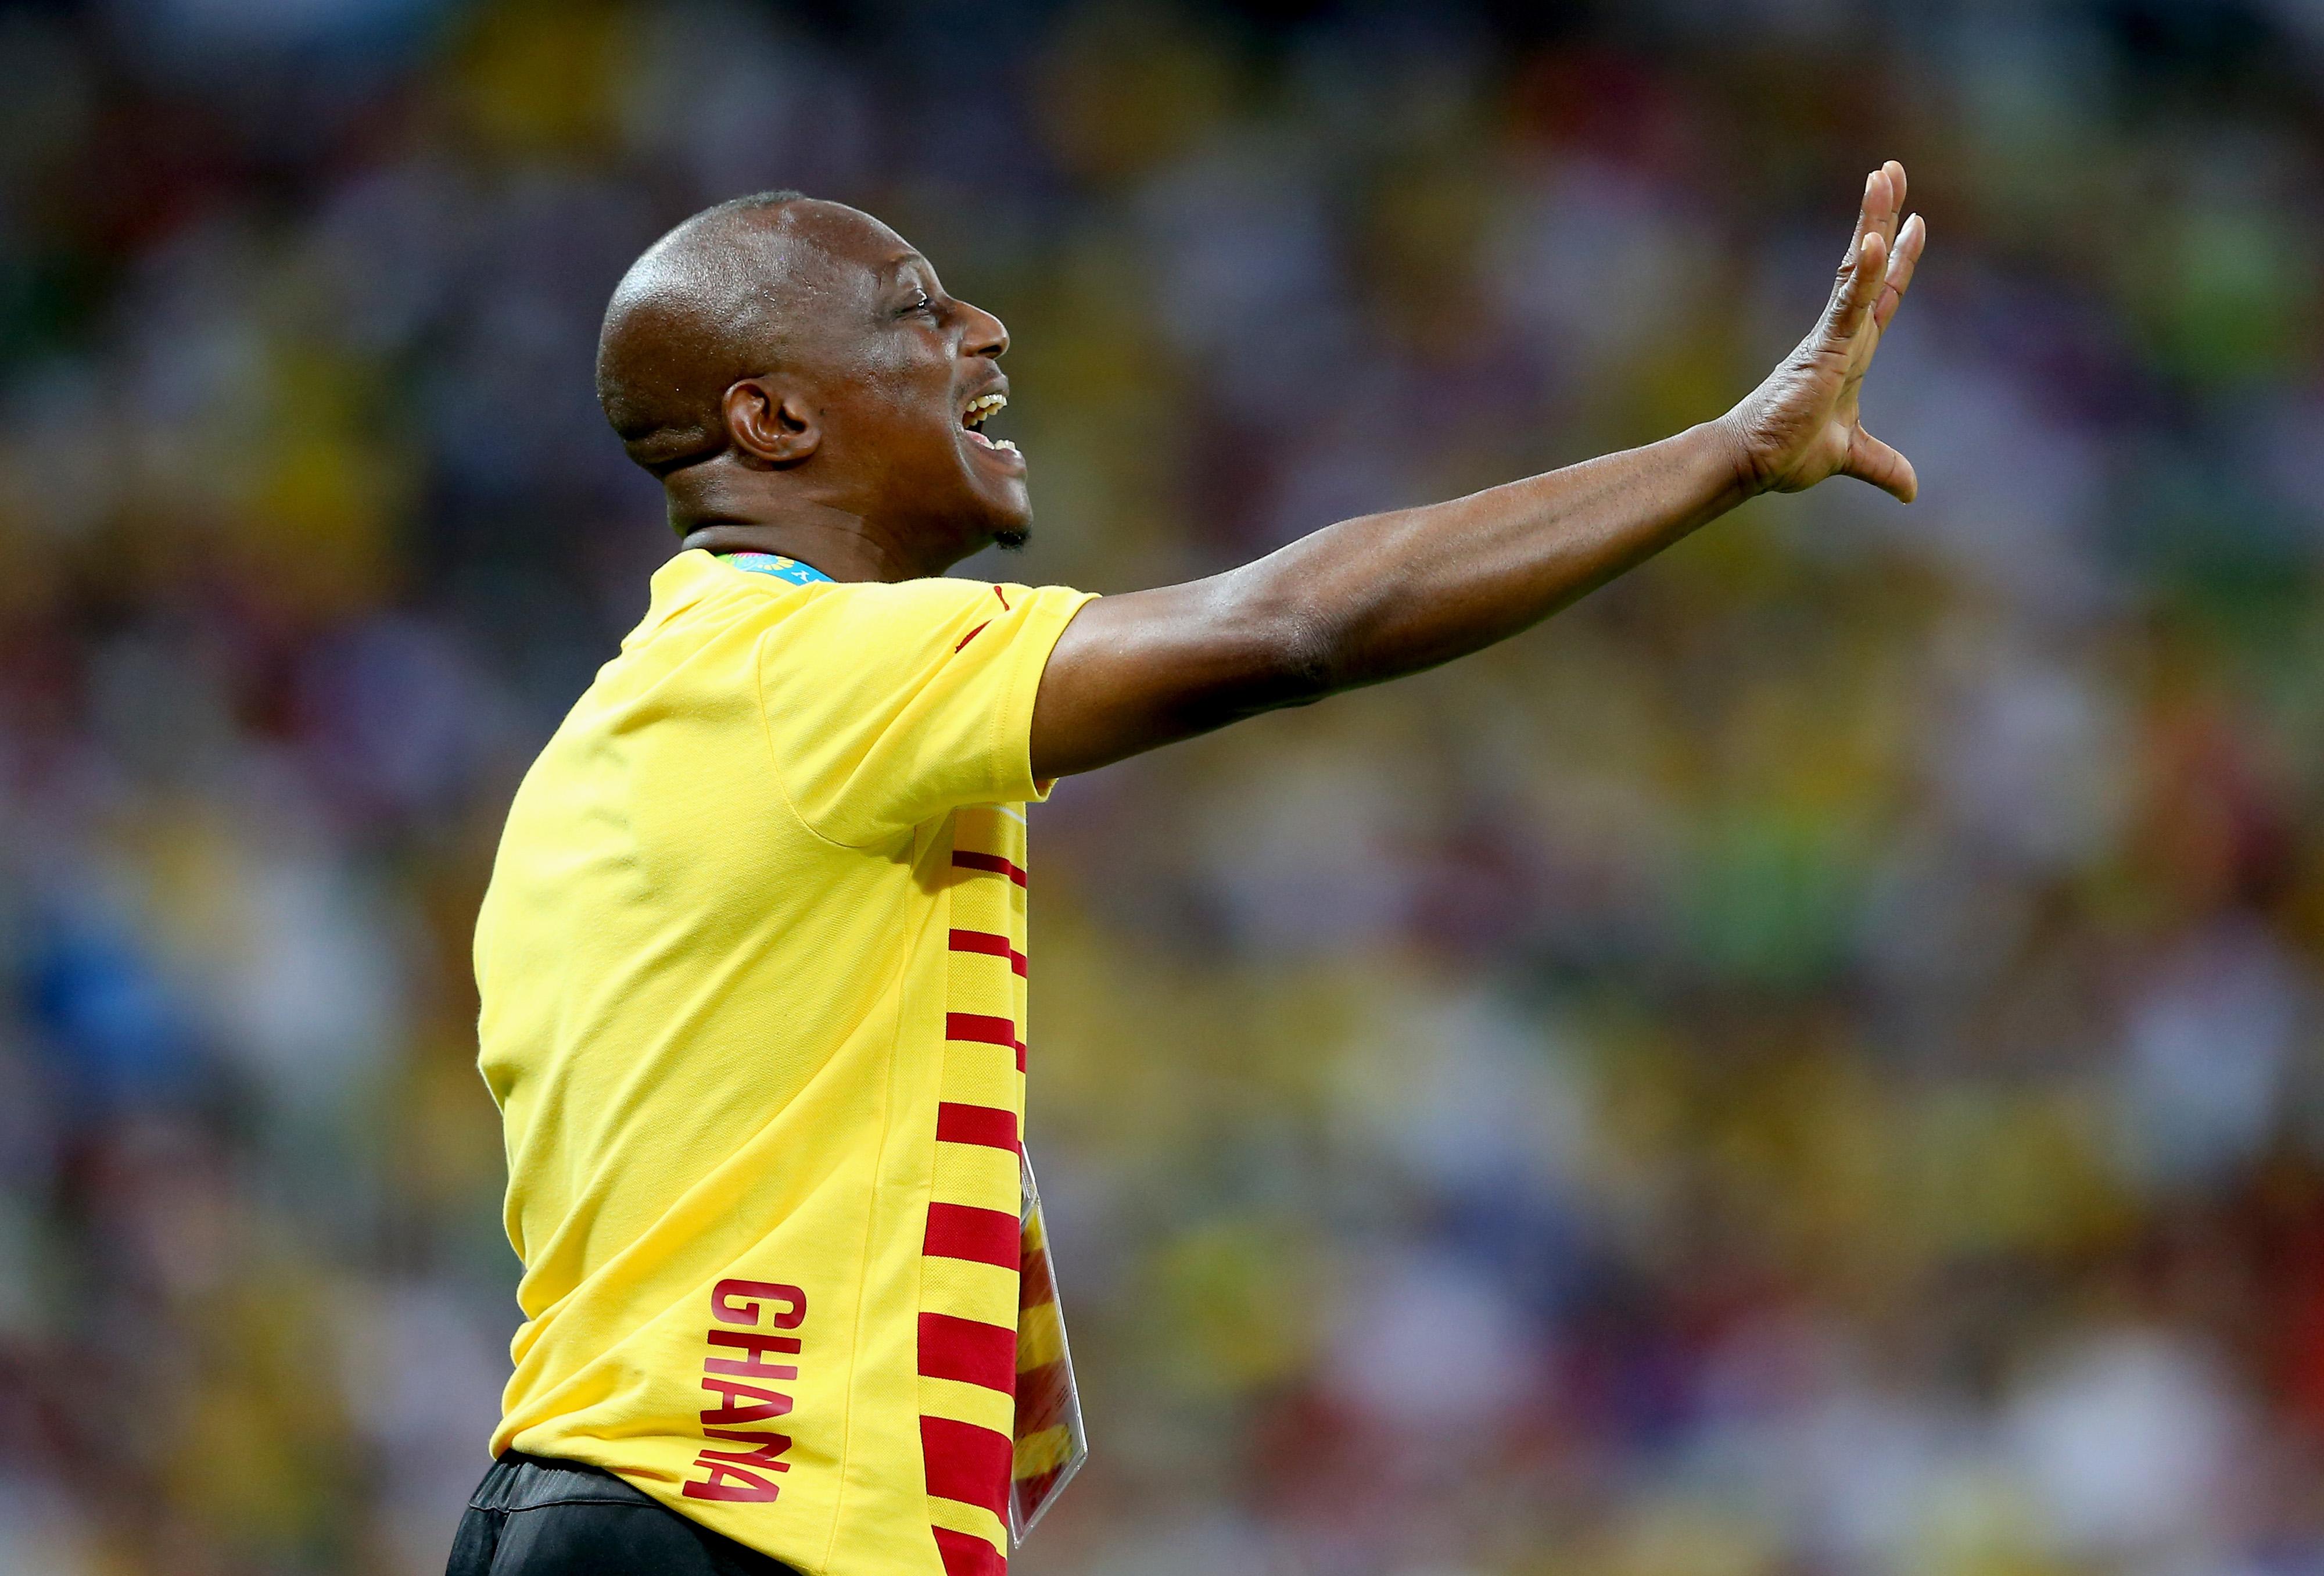 Kwesi Appiah - Germany vs Ghana - World Cup 210614